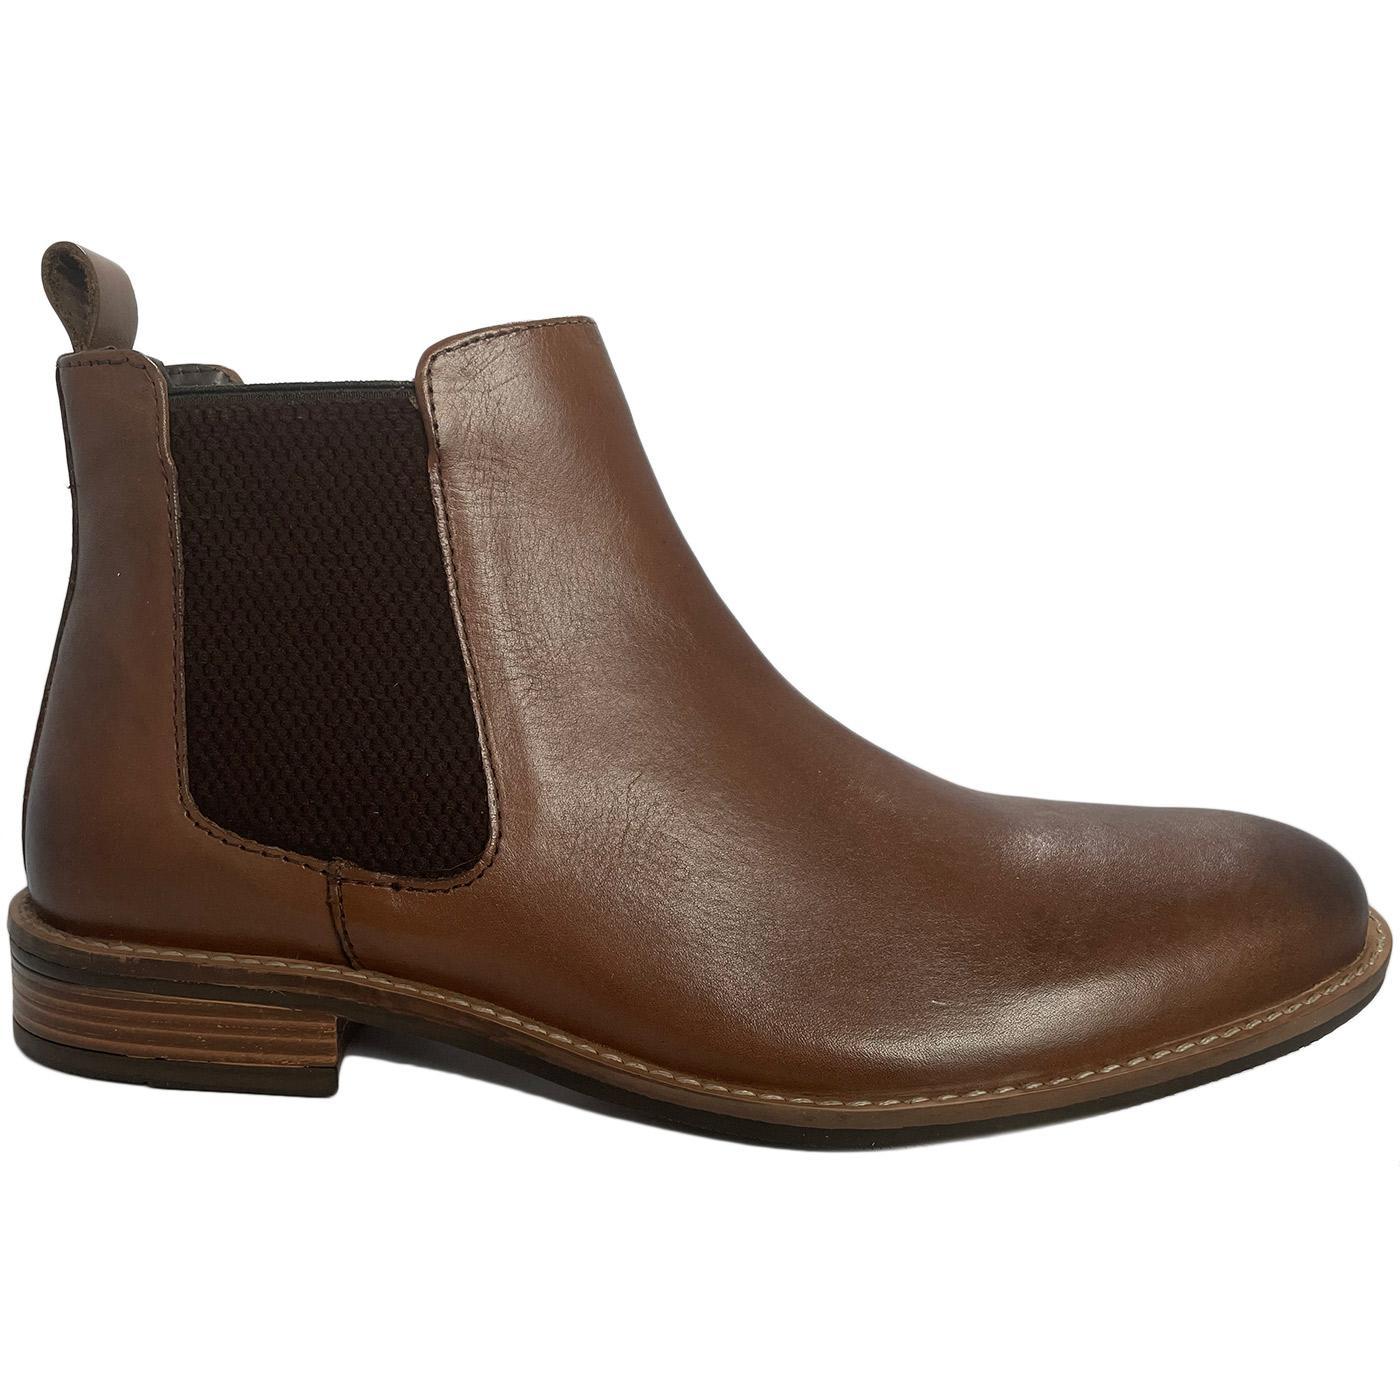 Men's Retro Mod Leather Chelsea Boots (Brown)